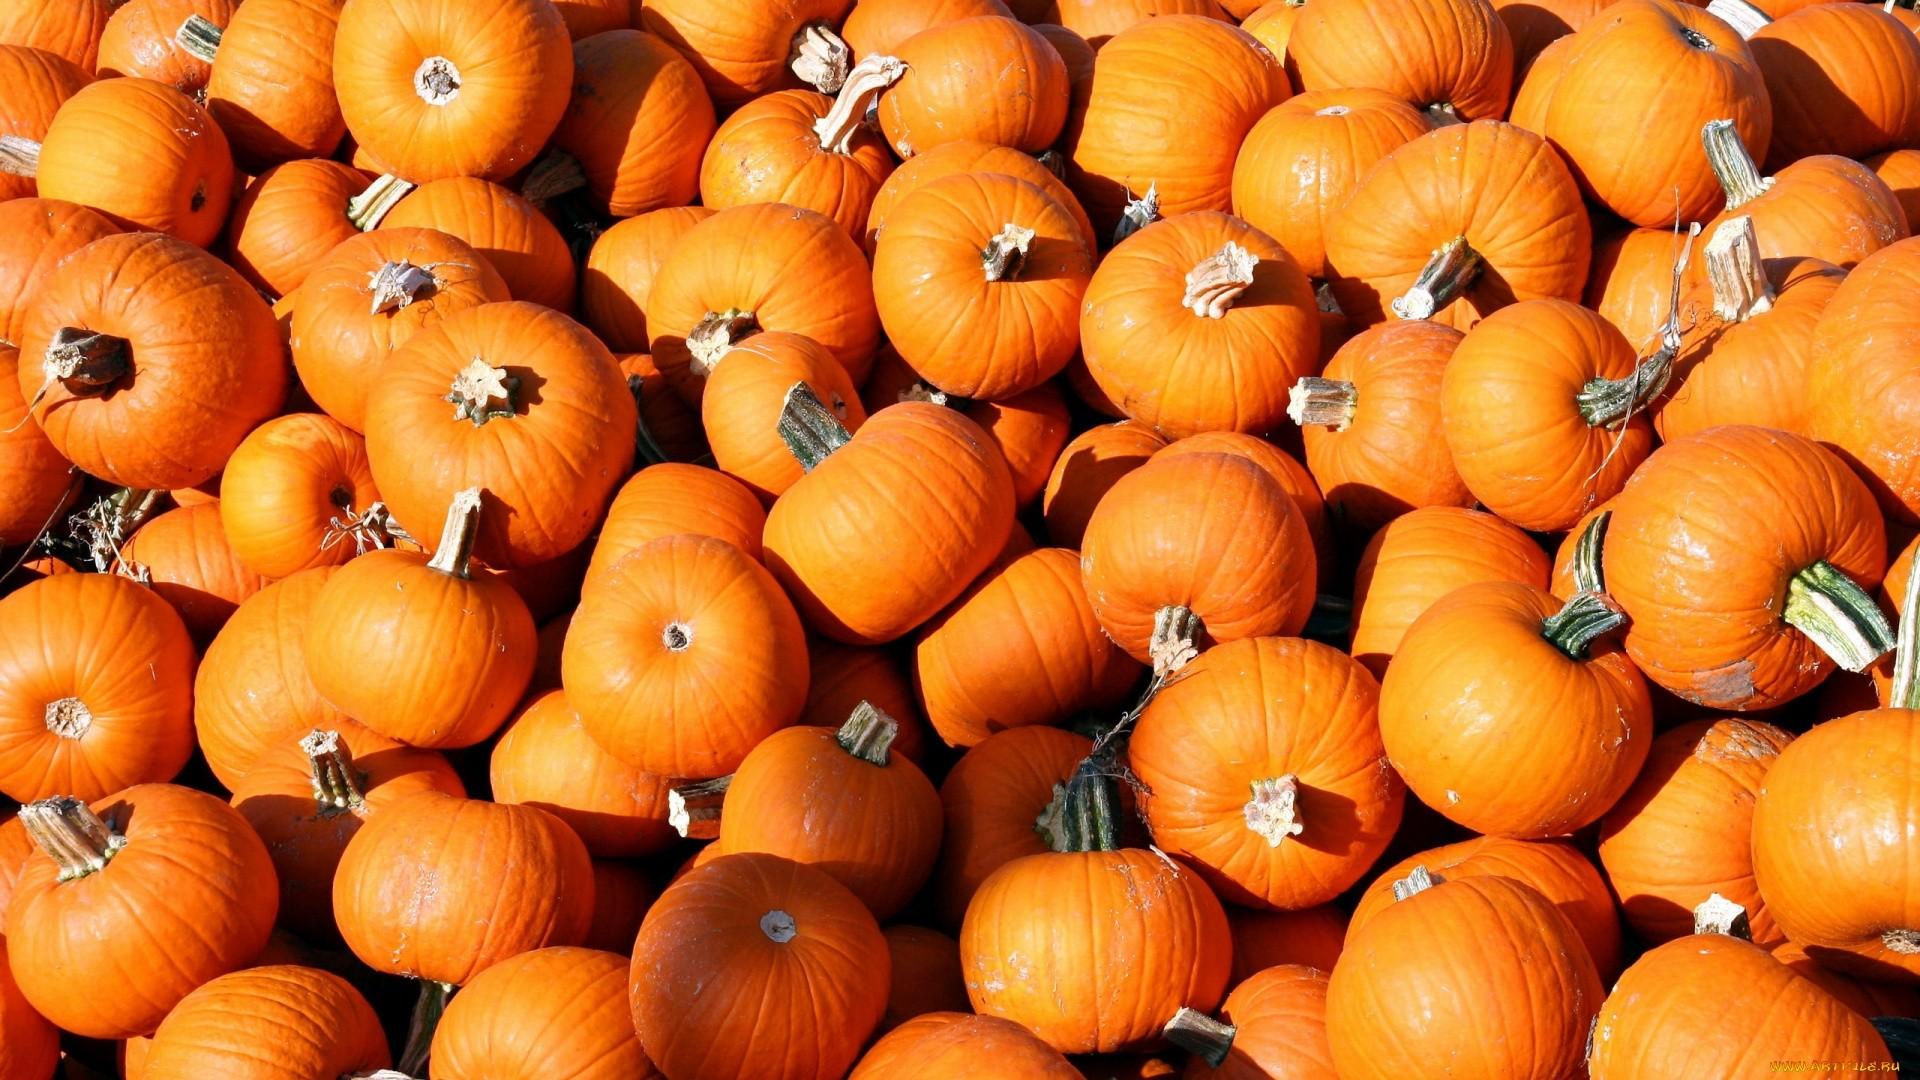 Pumpkin hd wallpaper download